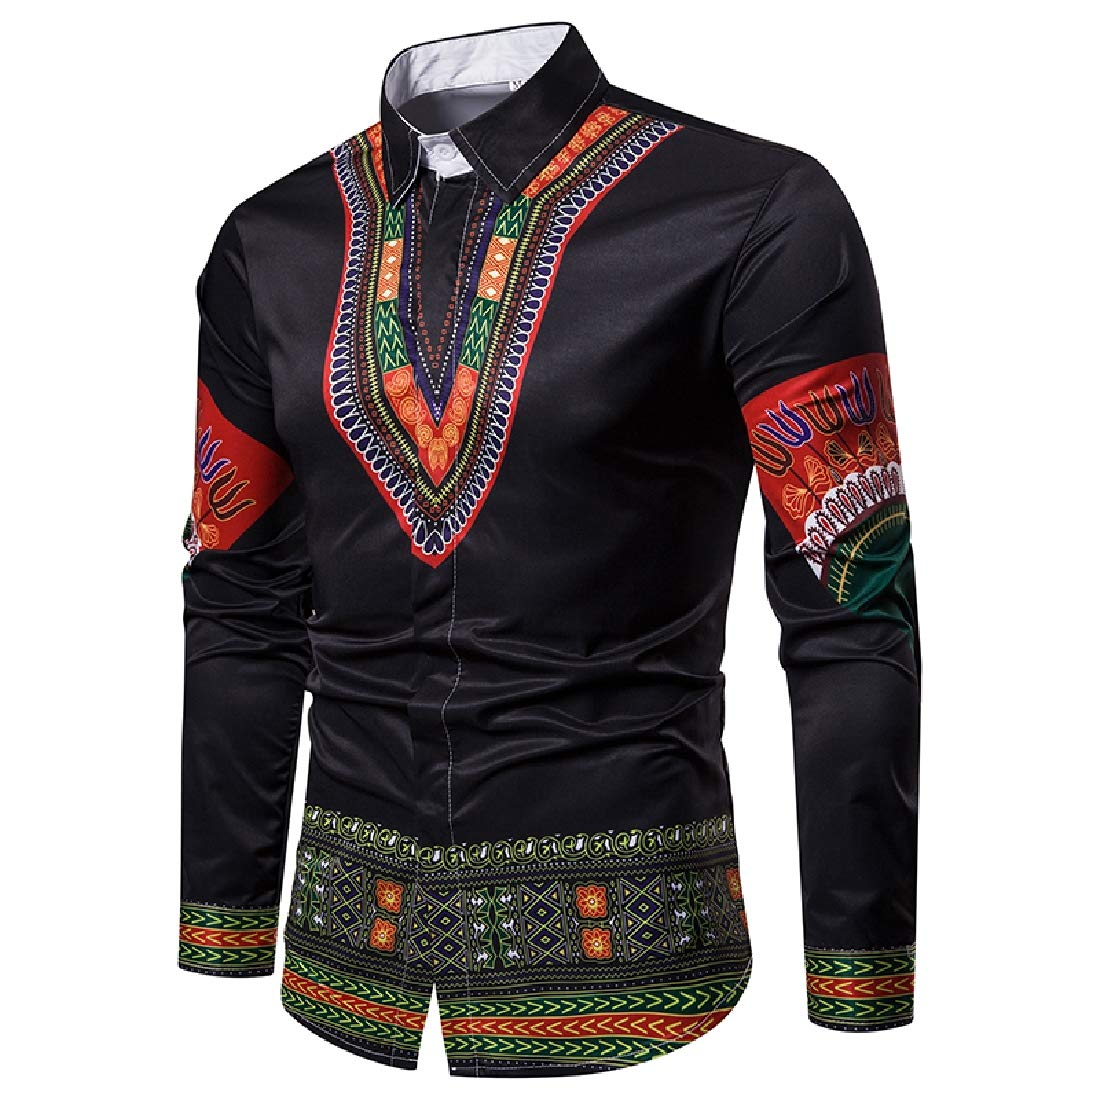 Coolred-Men Turn Down Collar Navajo Floral Dashiki Long-Sleeve African 3D Dress Shirts